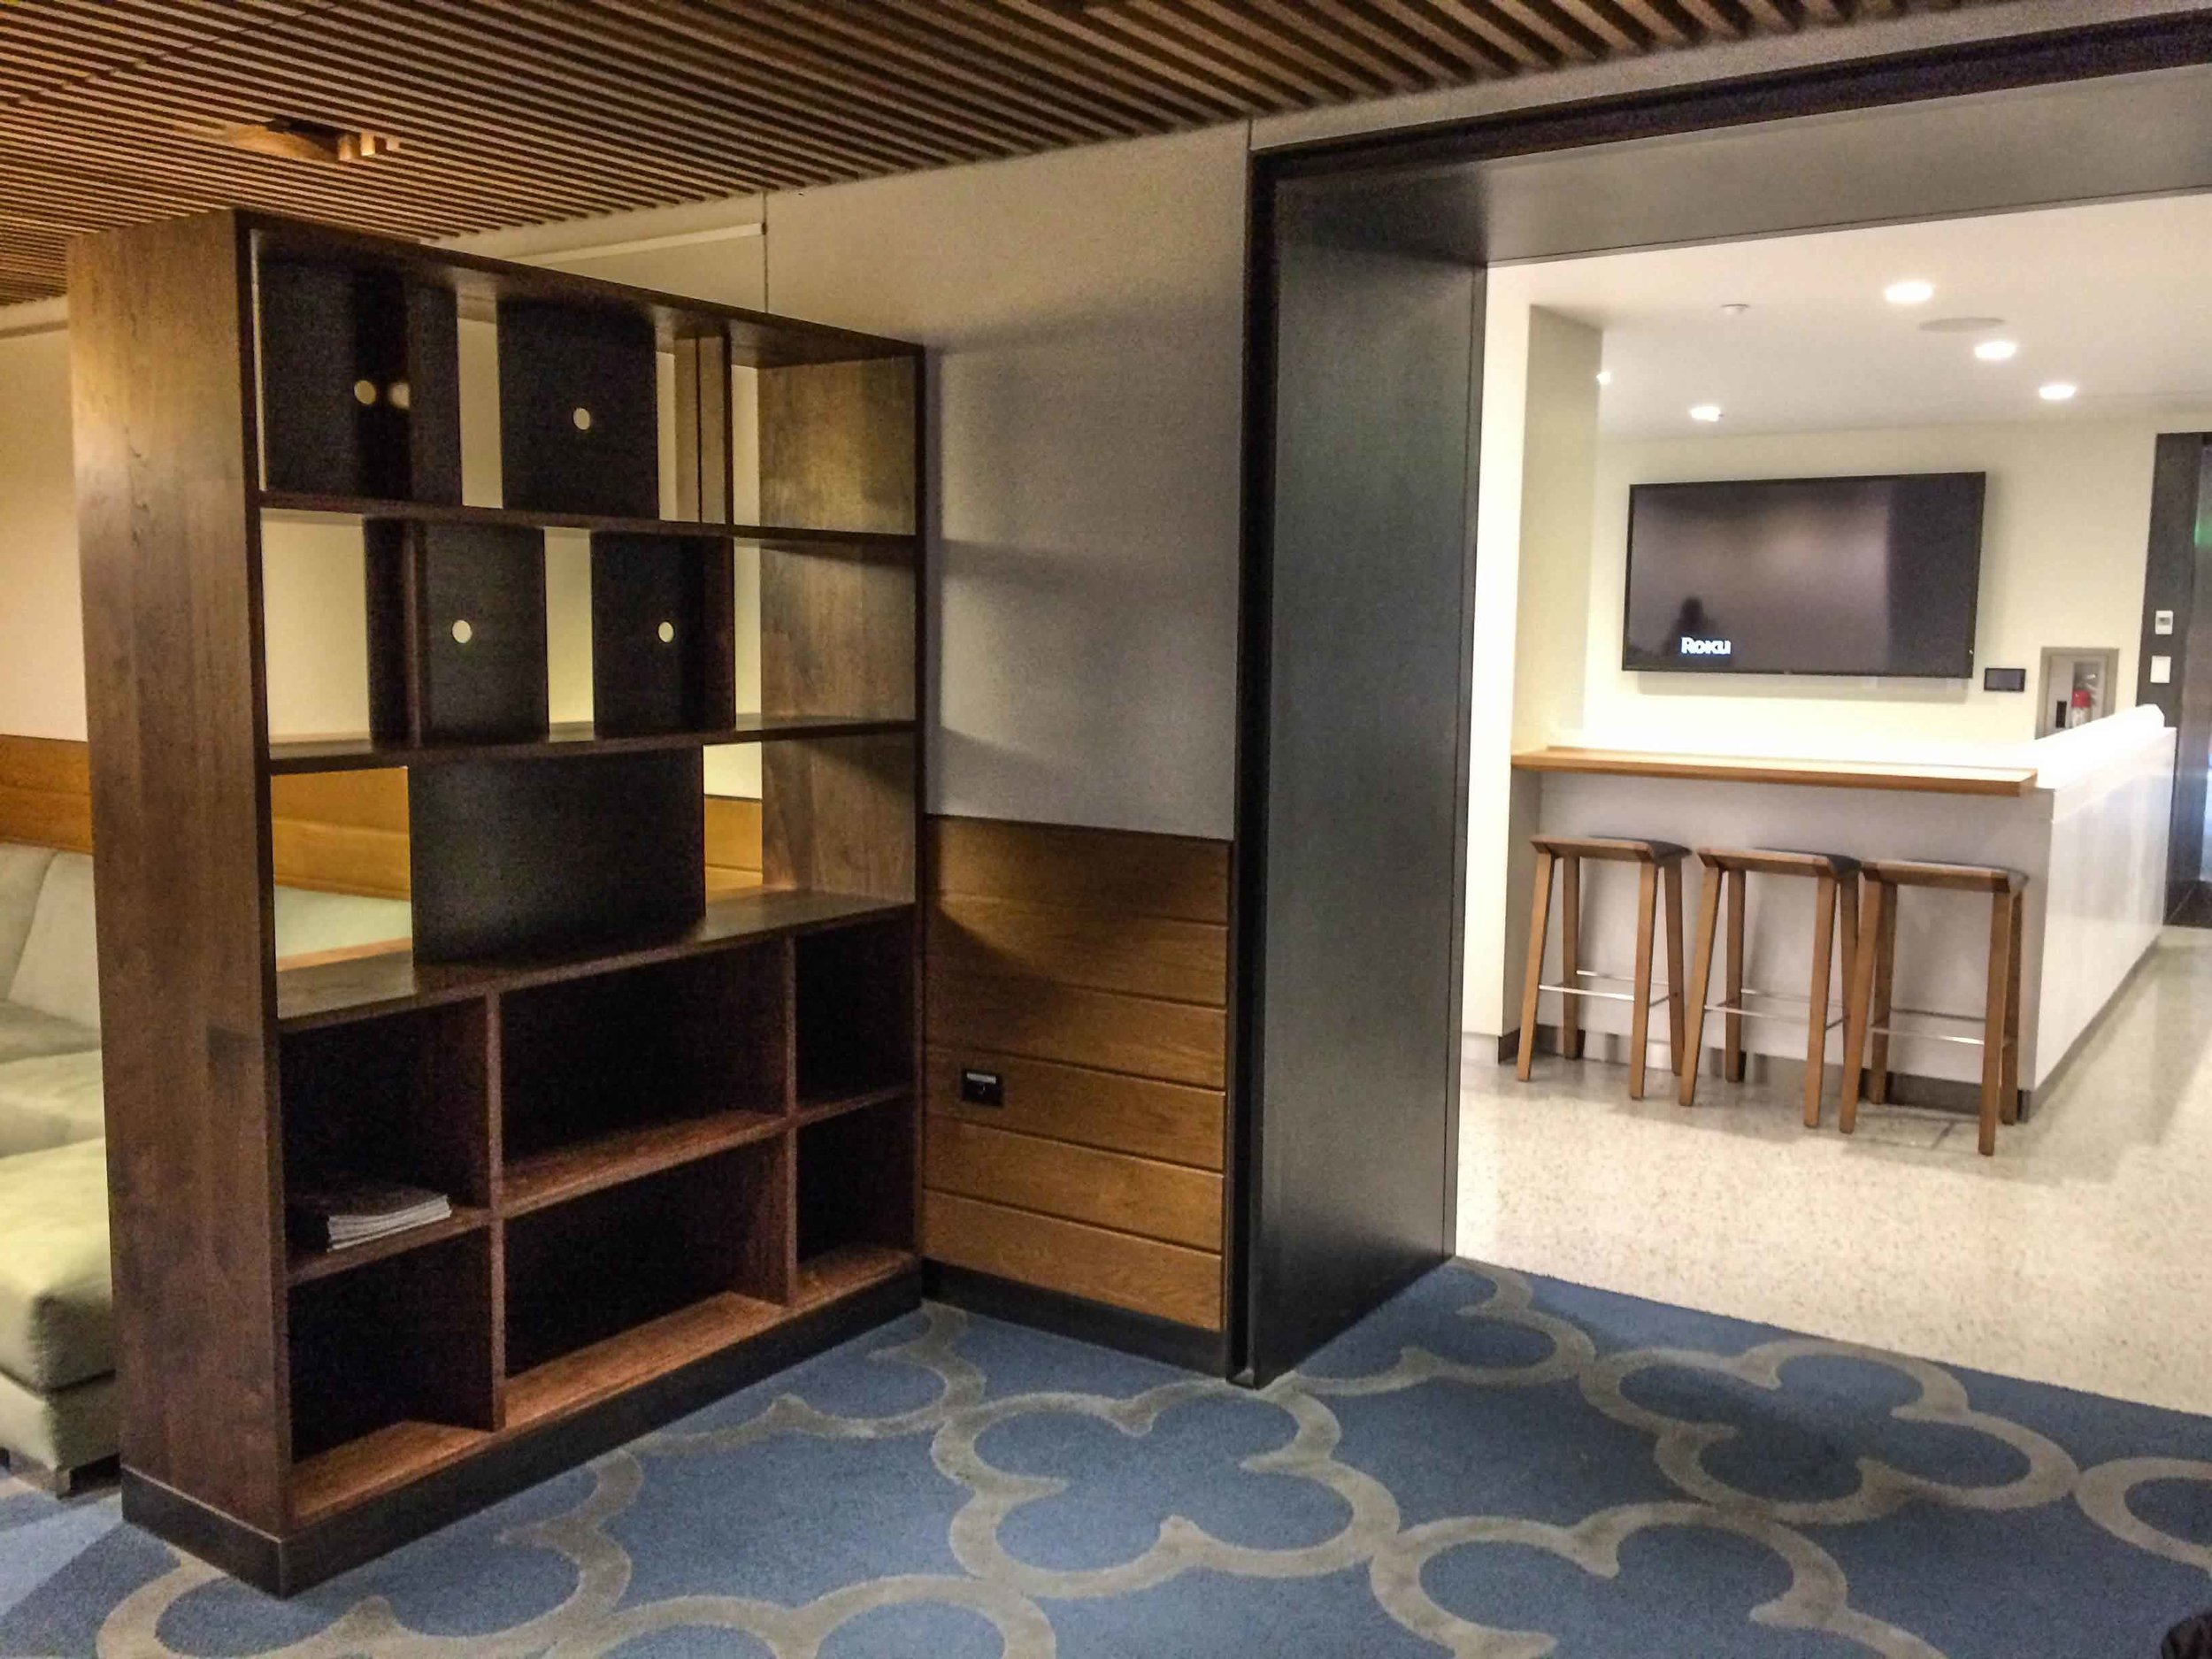 duke-bookcases-3841a.jpg